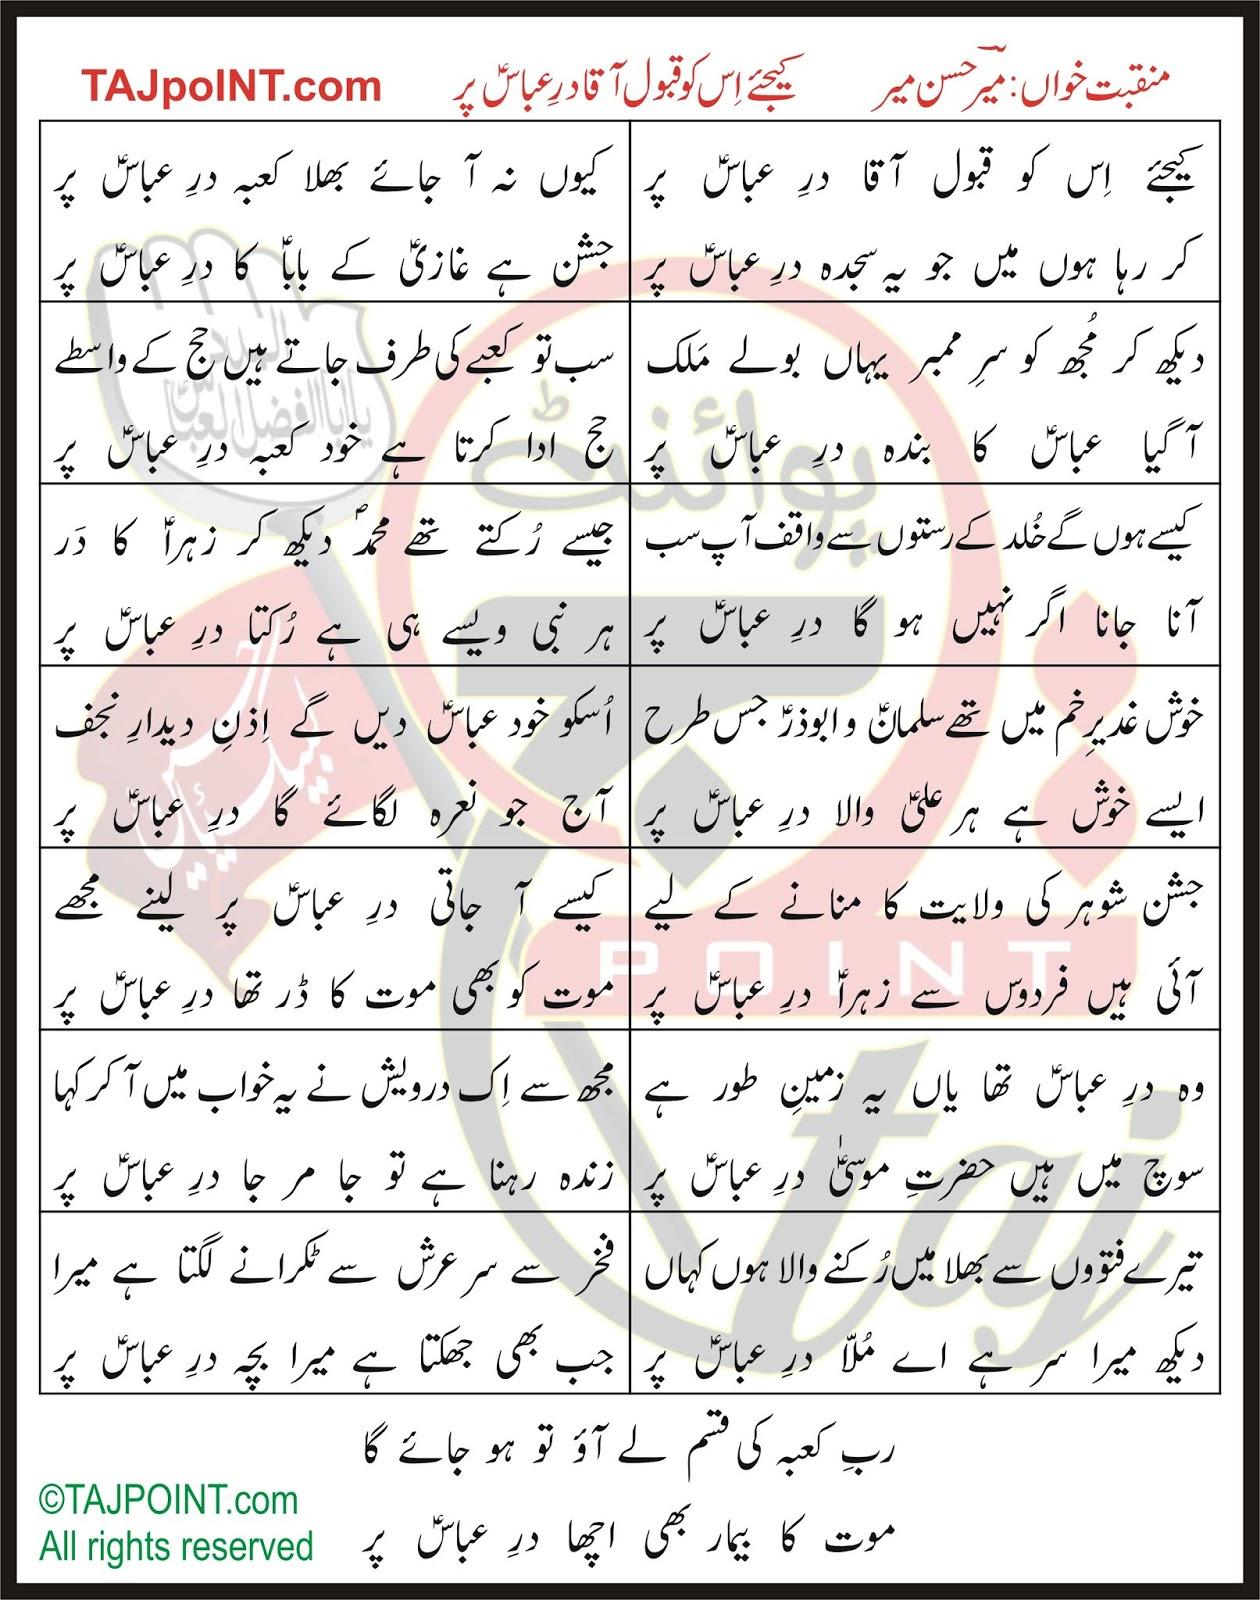 Kijiye Iss Ko Qabool Aaqa Dar-e-Abbas Par Lyrics in Urdu and